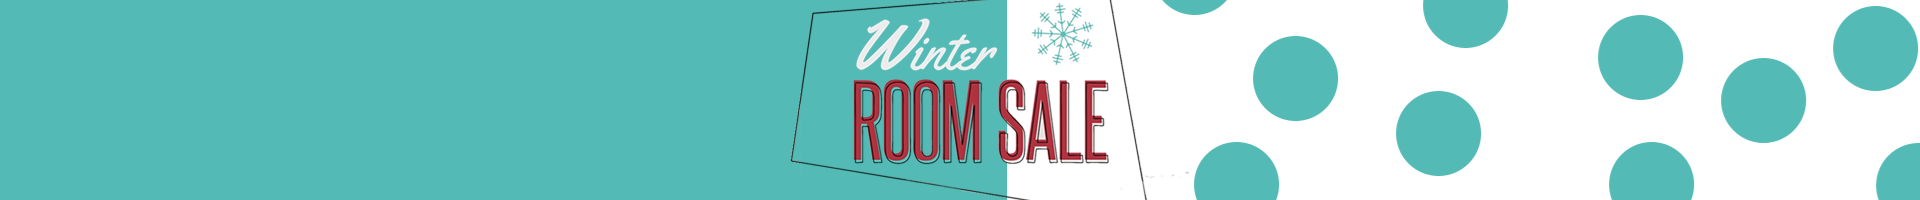 Winter Room Sale